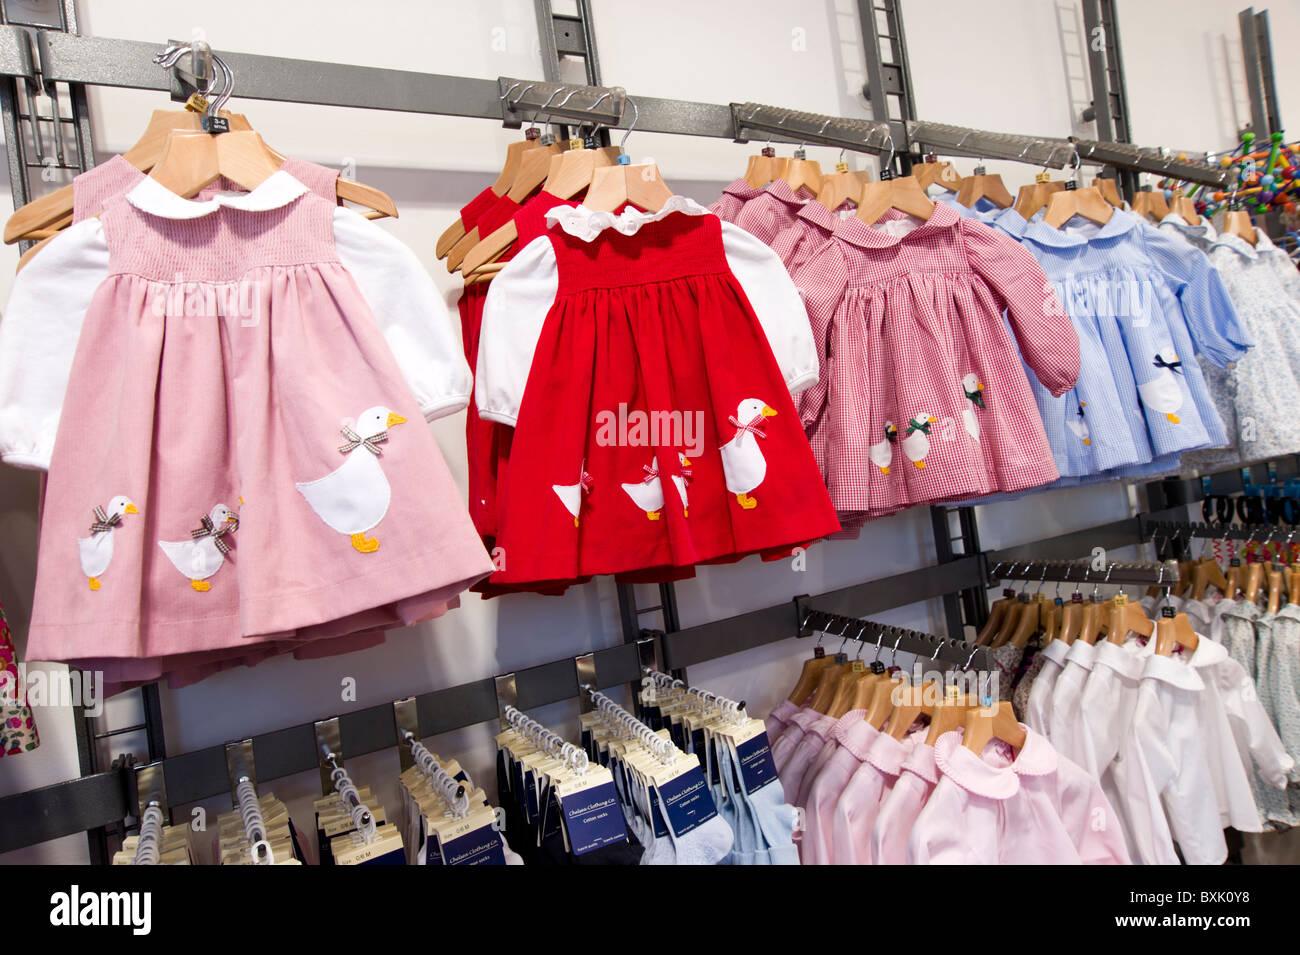 4904b027f97 Children s Clothes Store Stock Photos   Children s Clothes Store ...